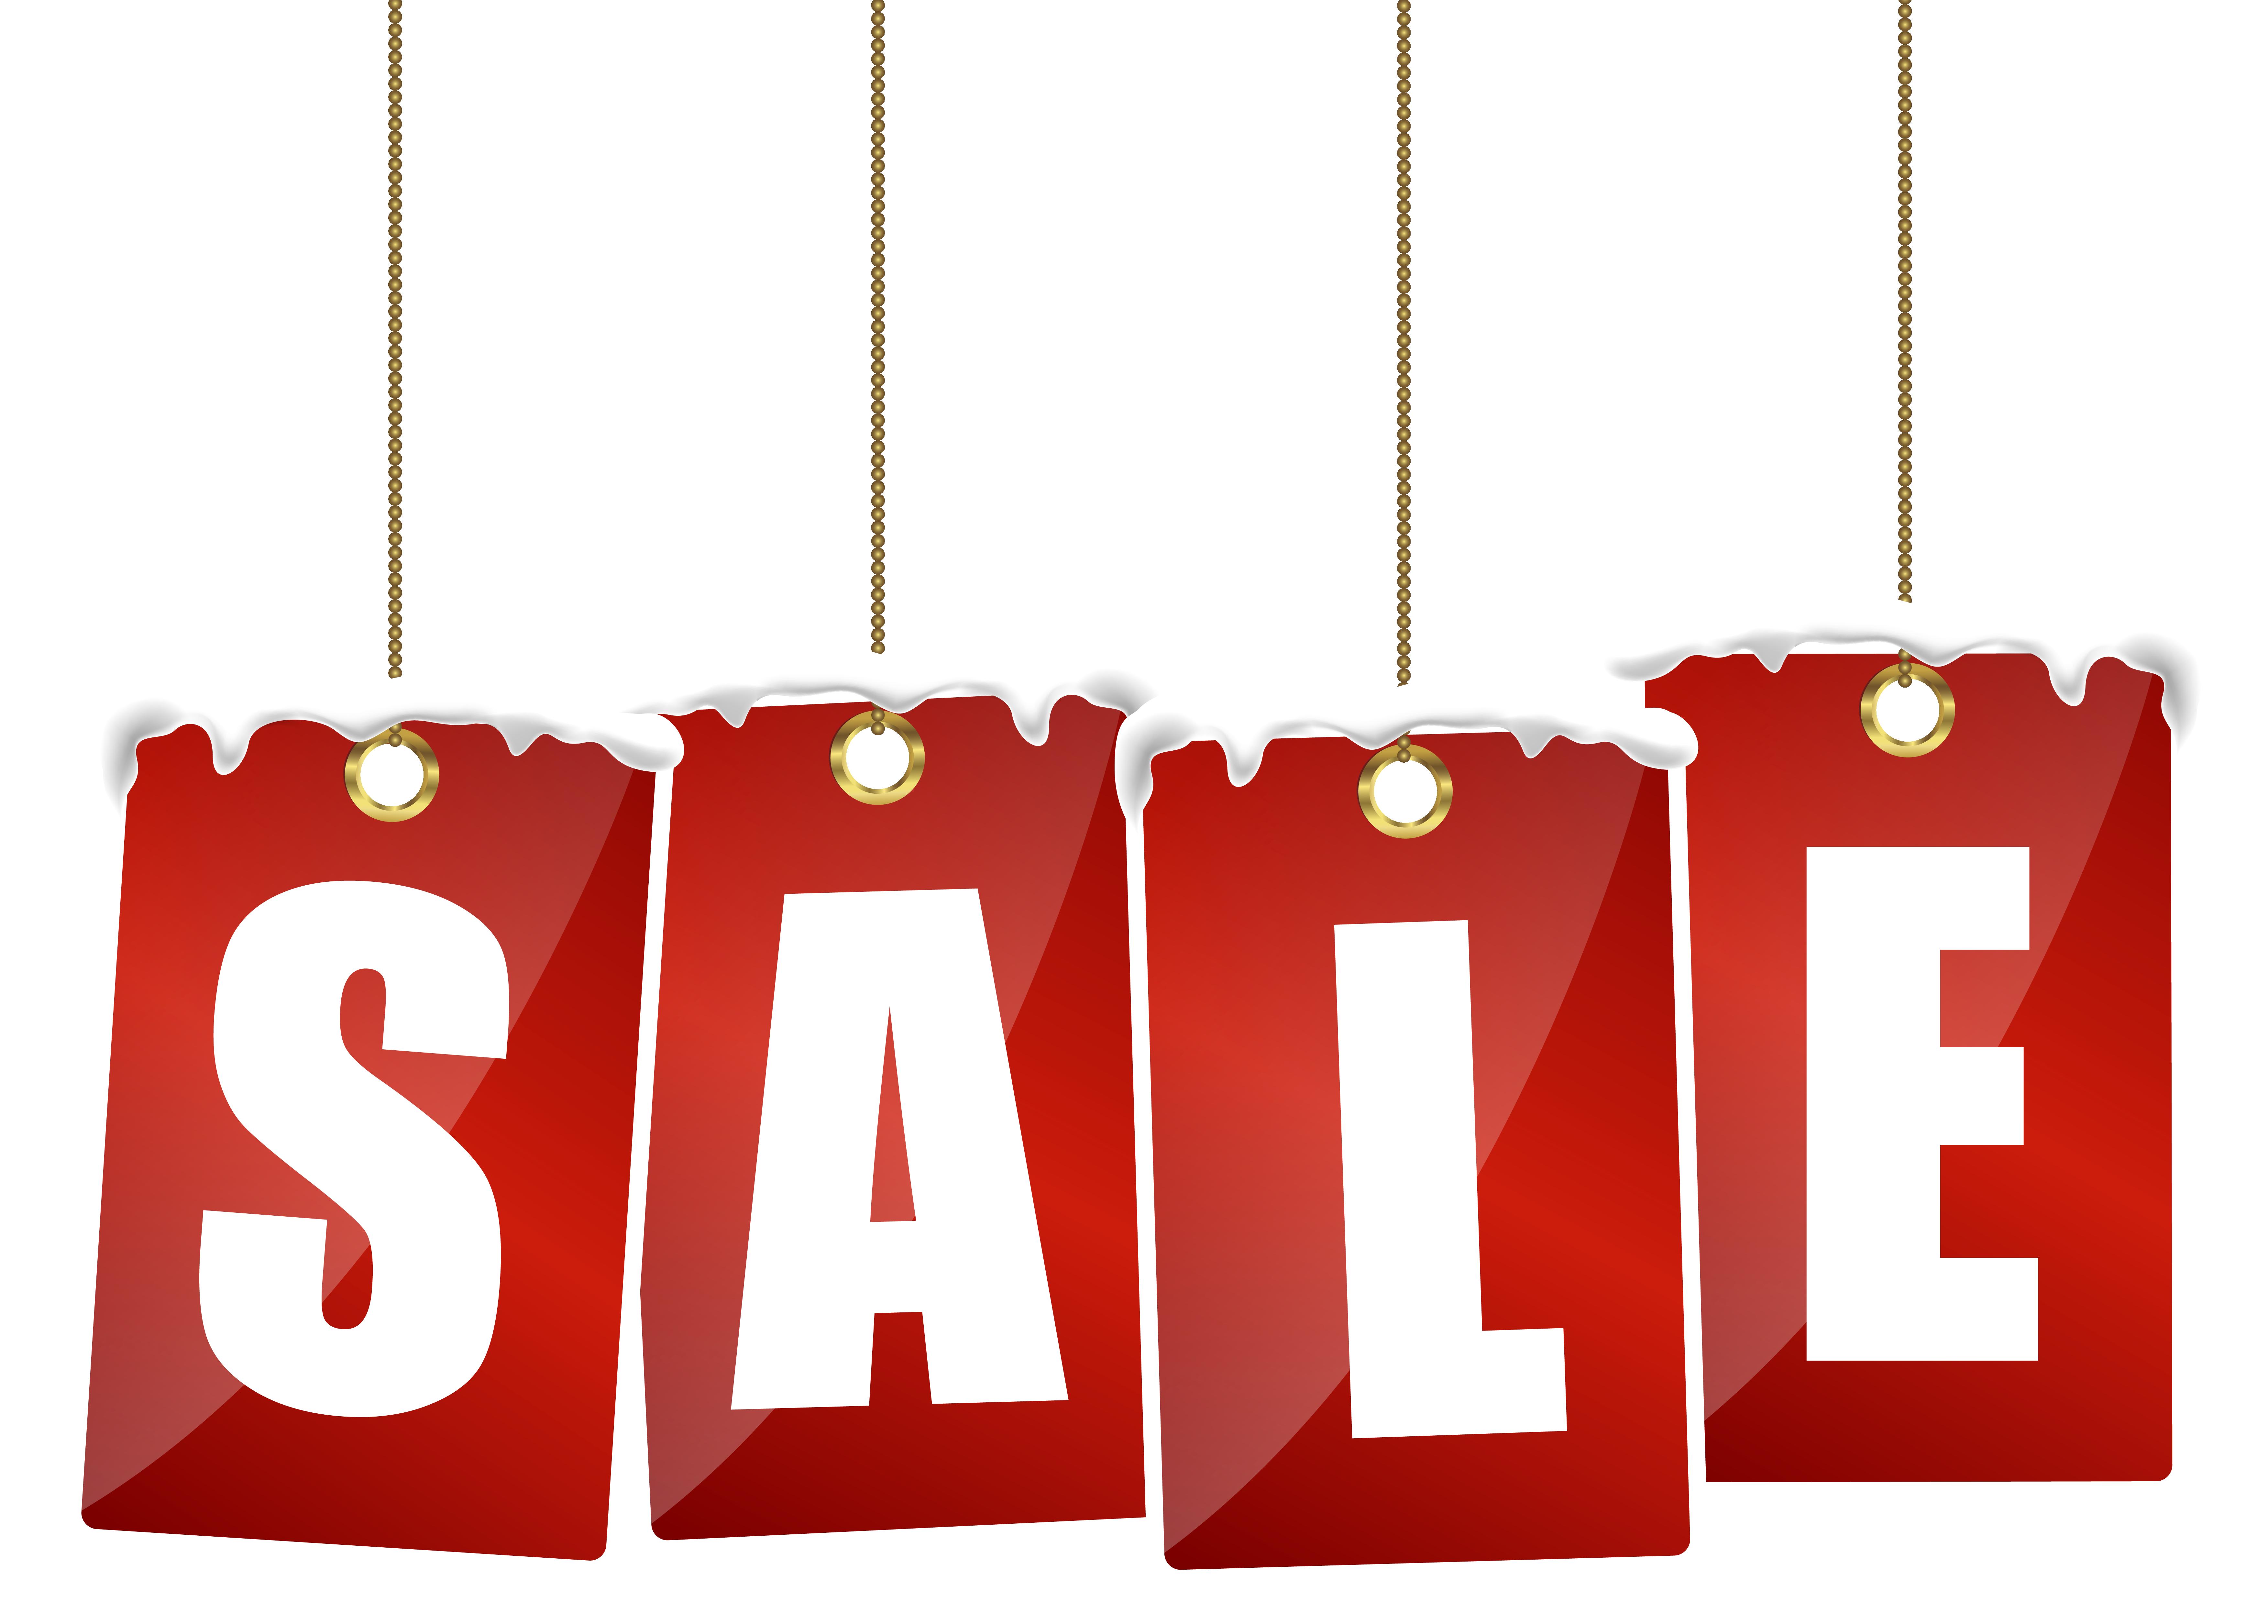 Wendsday sale clipart transparent download Sale Clipart Images   Free download best Sale Clipart Images ... transparent download